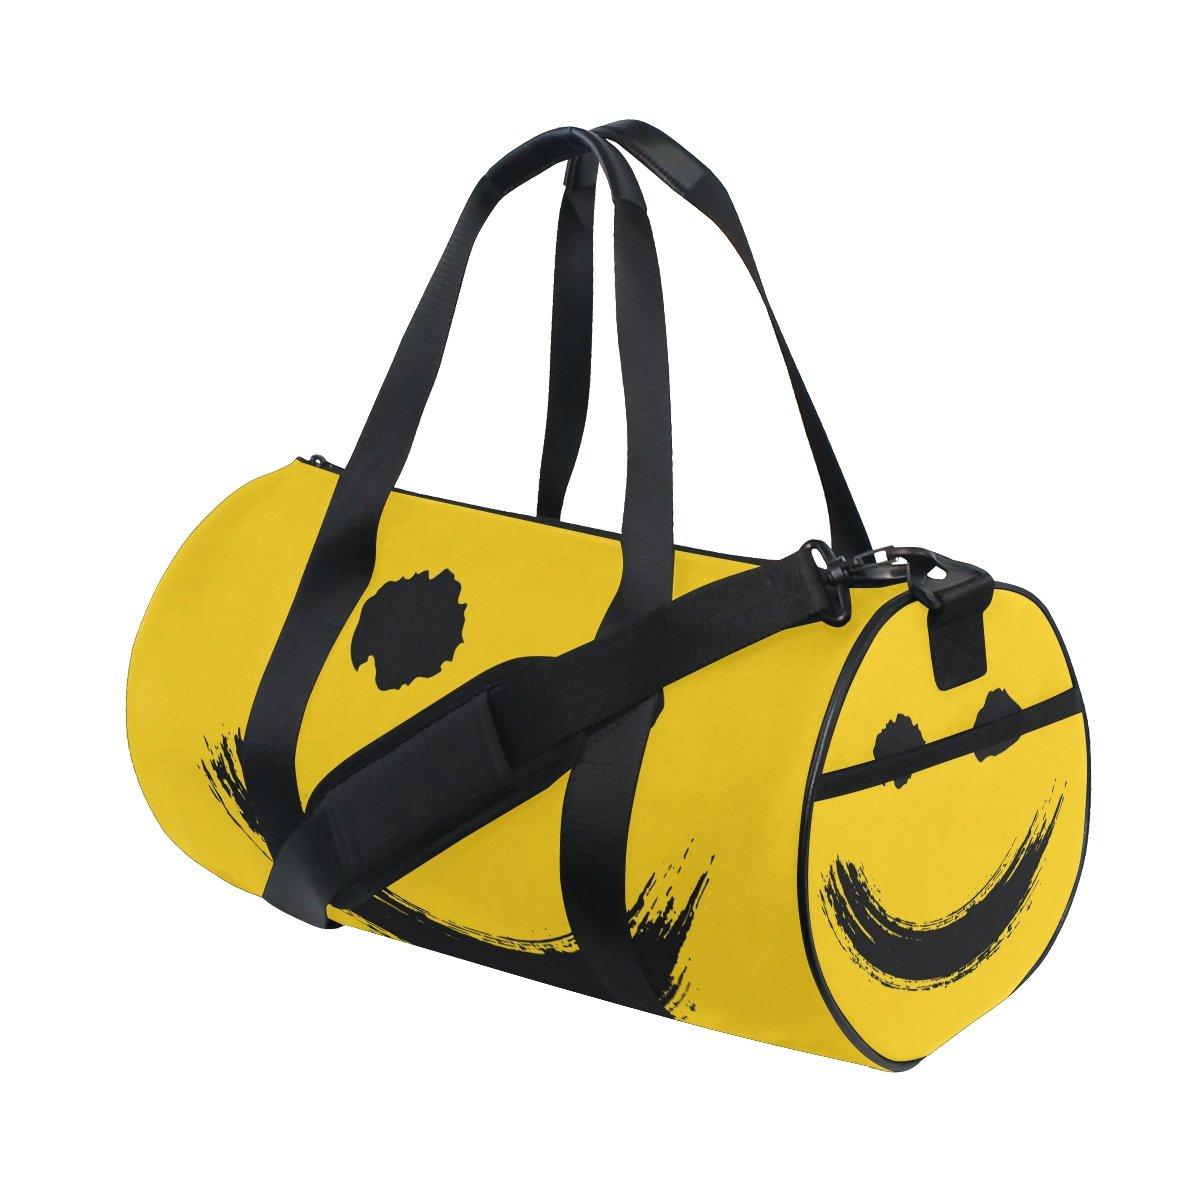 Naanle Yellow Emoji Smile Happy Face Emoticon Gym bag Sports Travel Duffle Bags for Men Women Boys Girls Kids